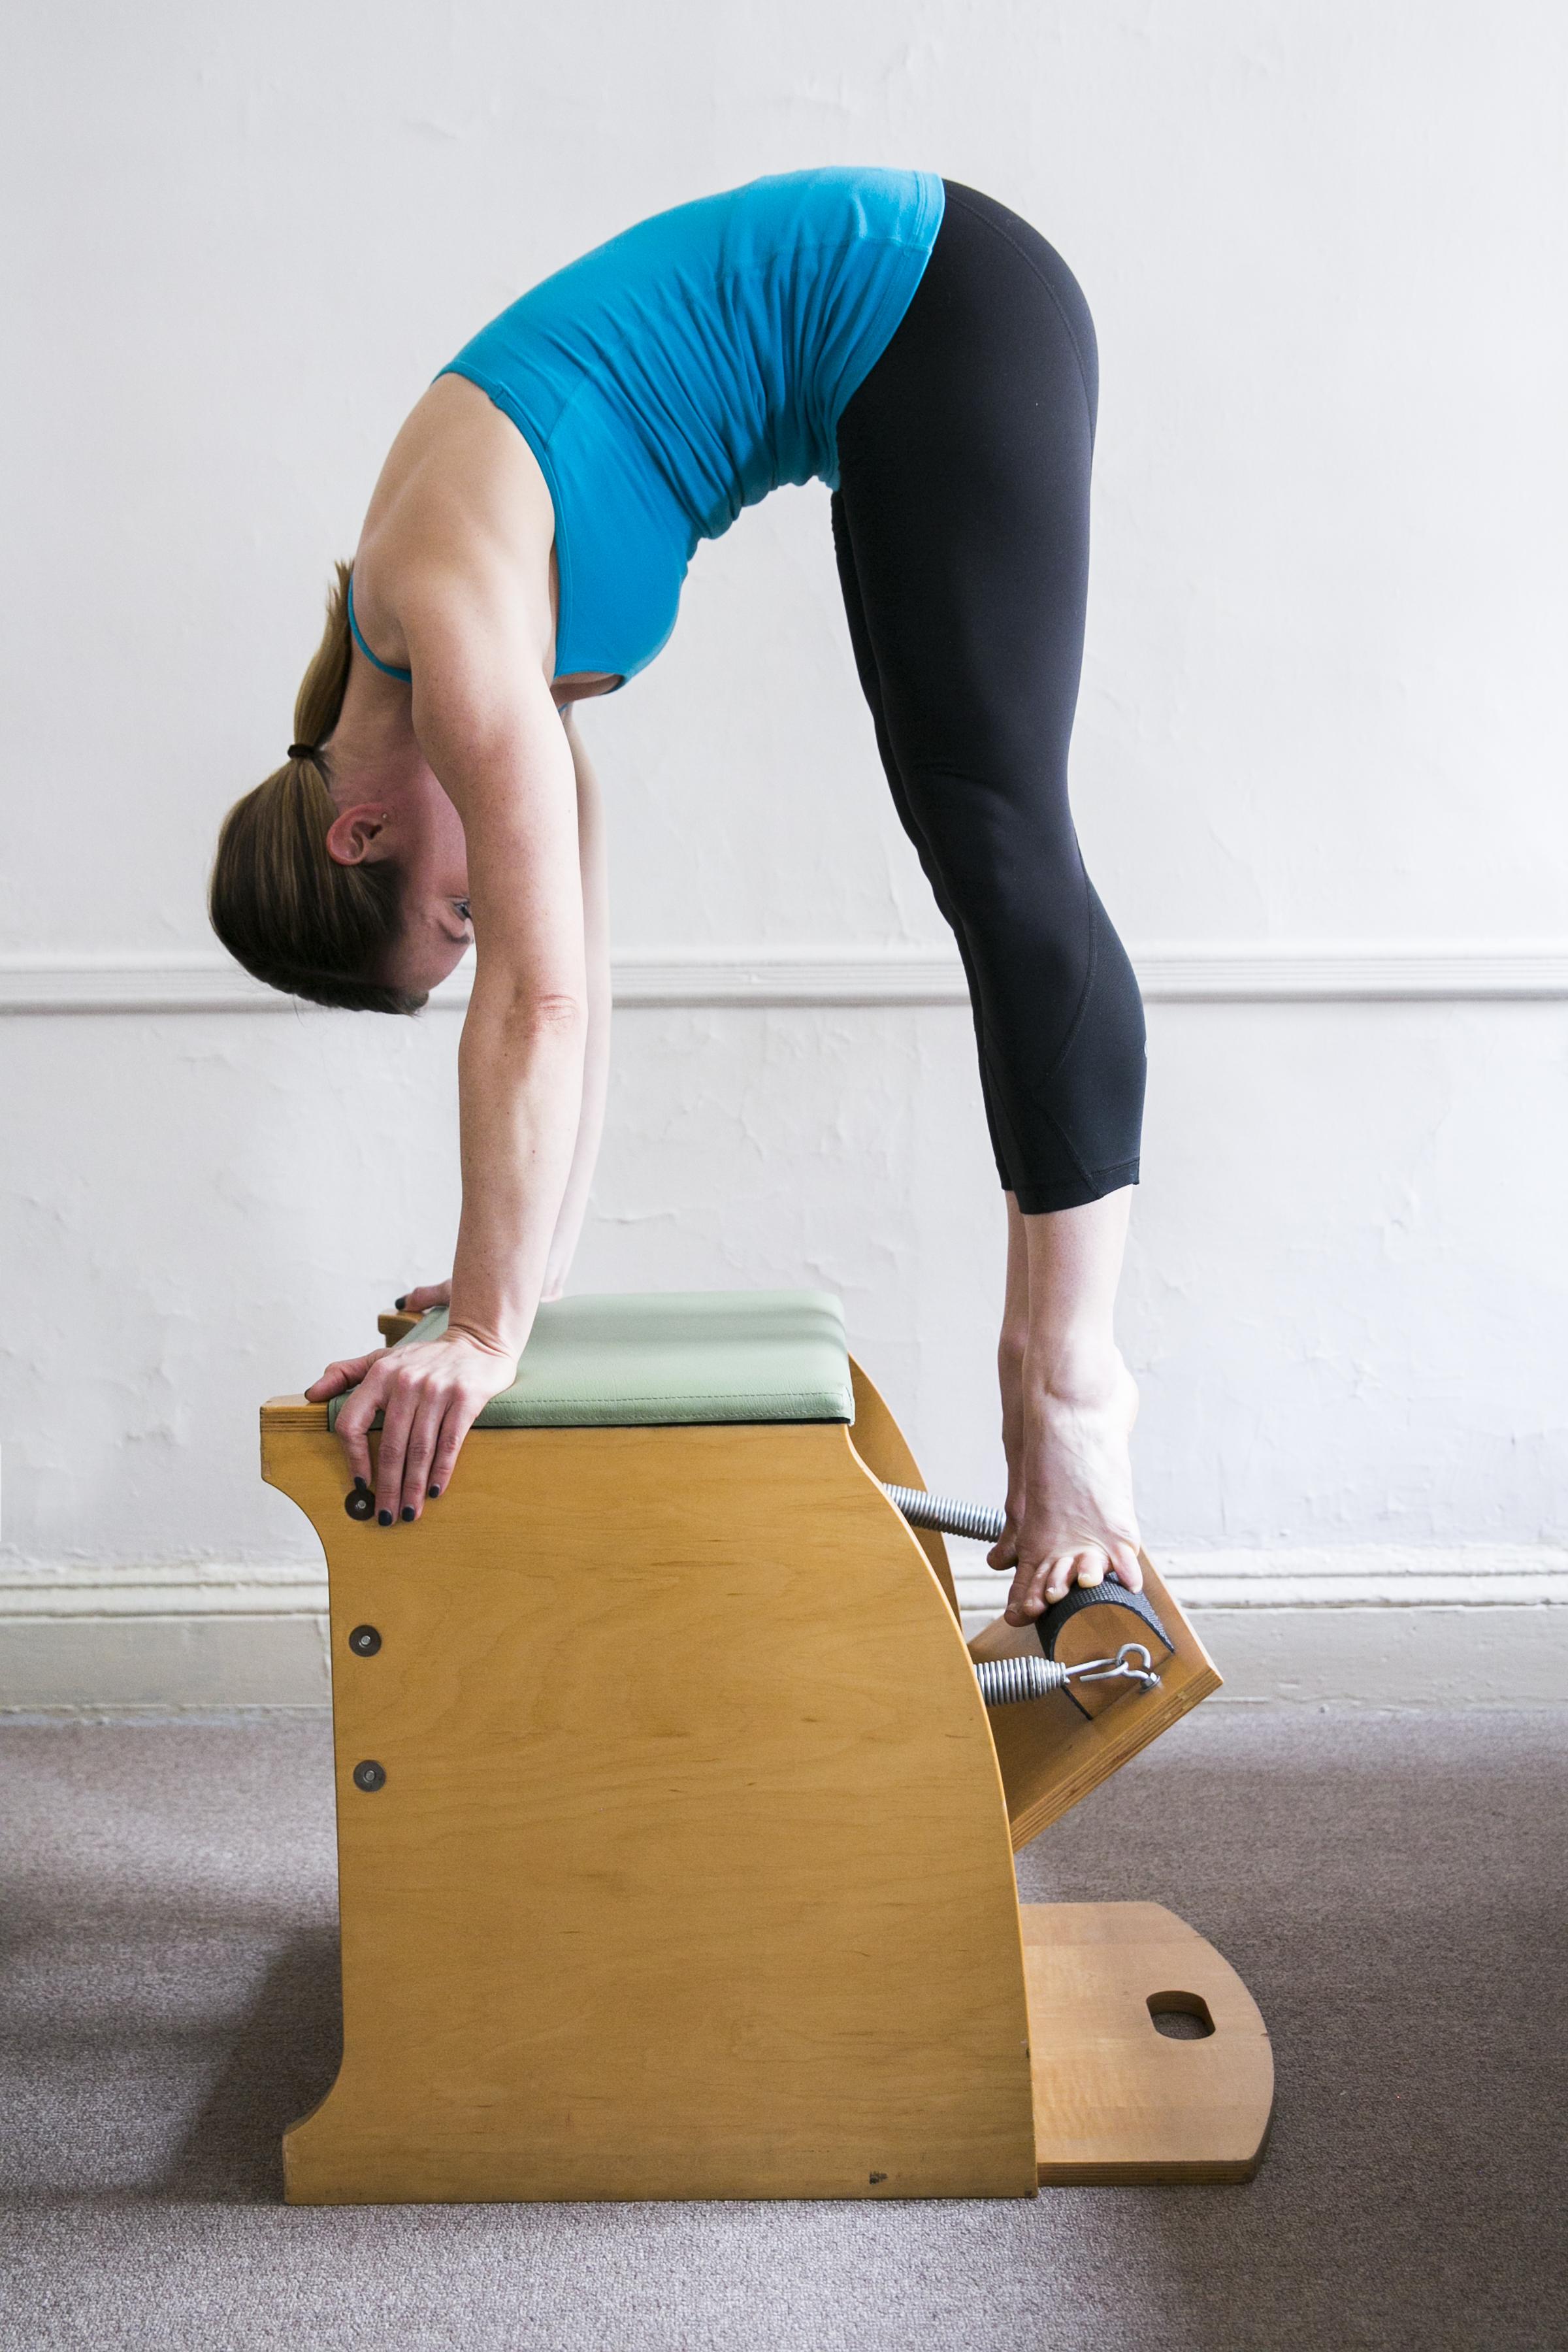 150325_DanielleRusso_Pilates_WhitneyBrowne-104.jpg